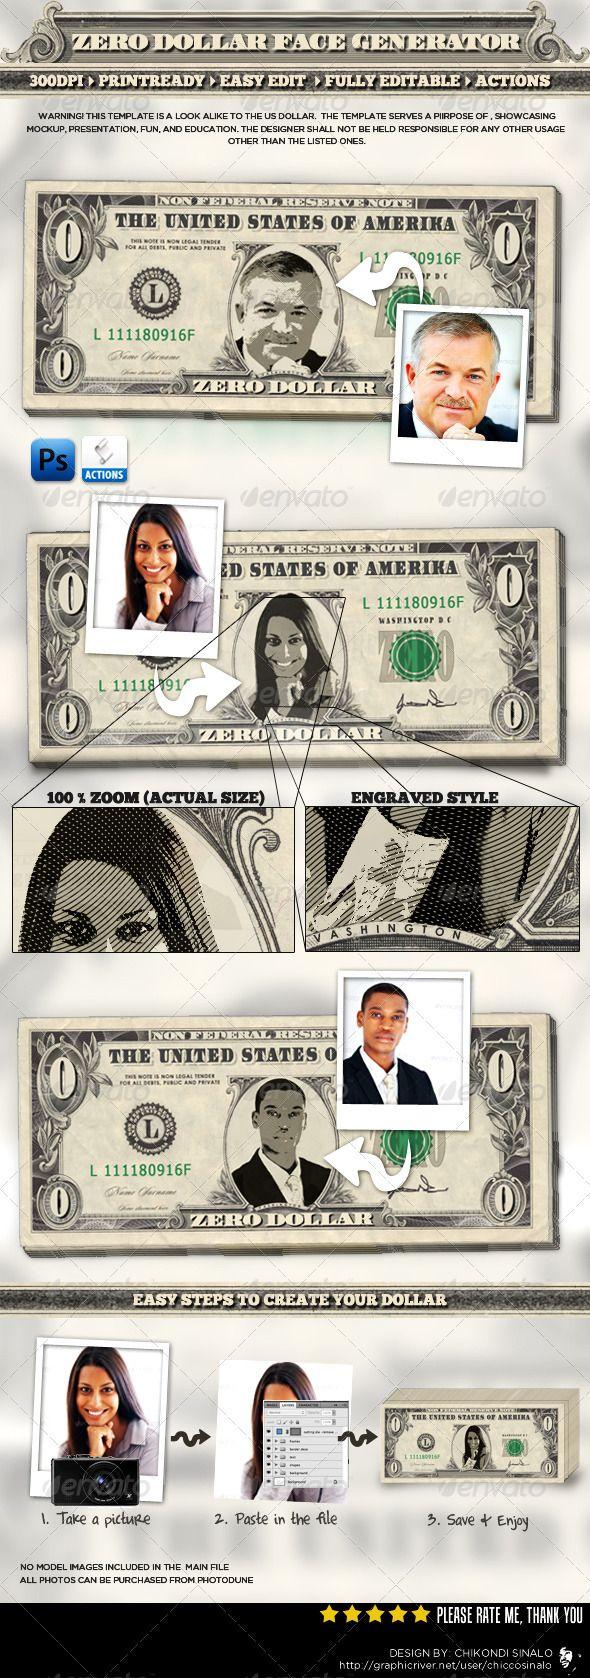 Zero Dollar Face Generator